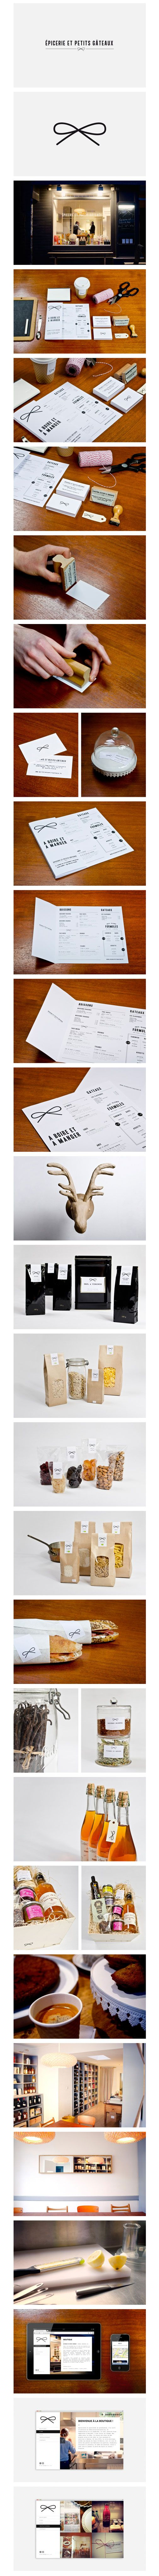 Epicerie et Petits Gâteaux | #stationary #corporate #design #corporatedesign #logo #identity #branding #marketing <<< repinned by an #advertising agency from #Hamburg / #Germany - www.BlickeDeeler.de